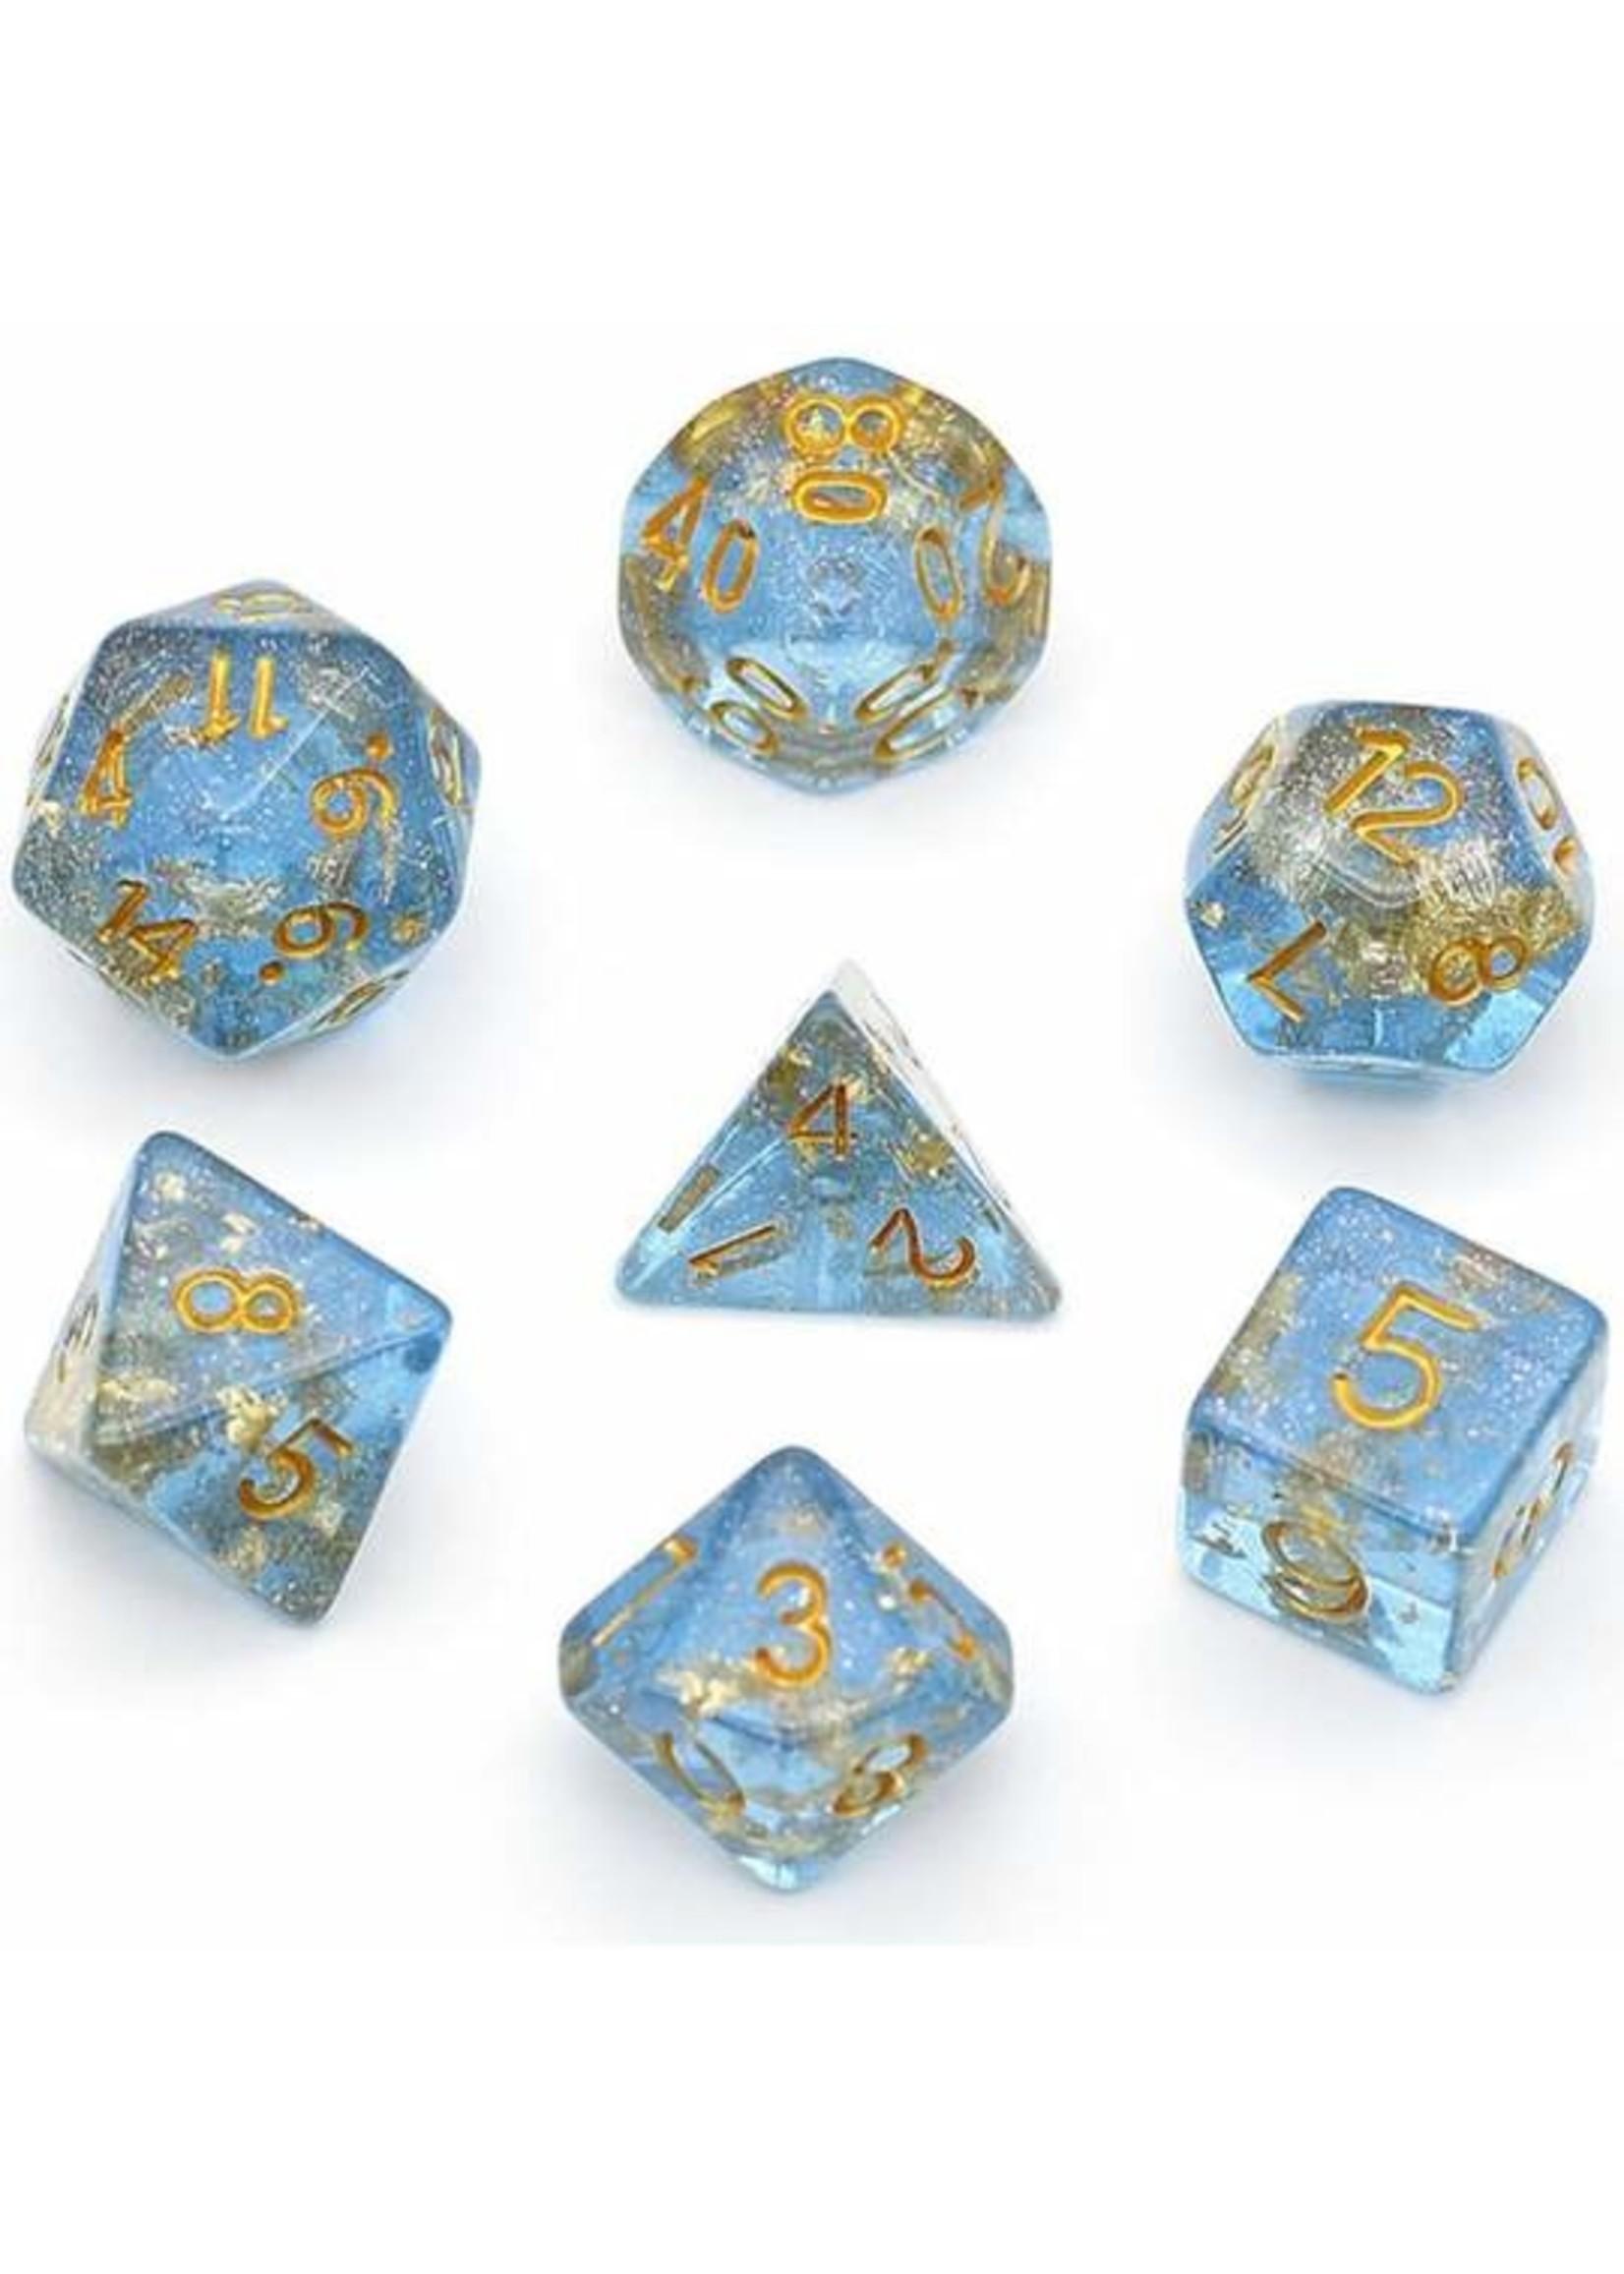 Blue with Gold Foil RPG Dice Set